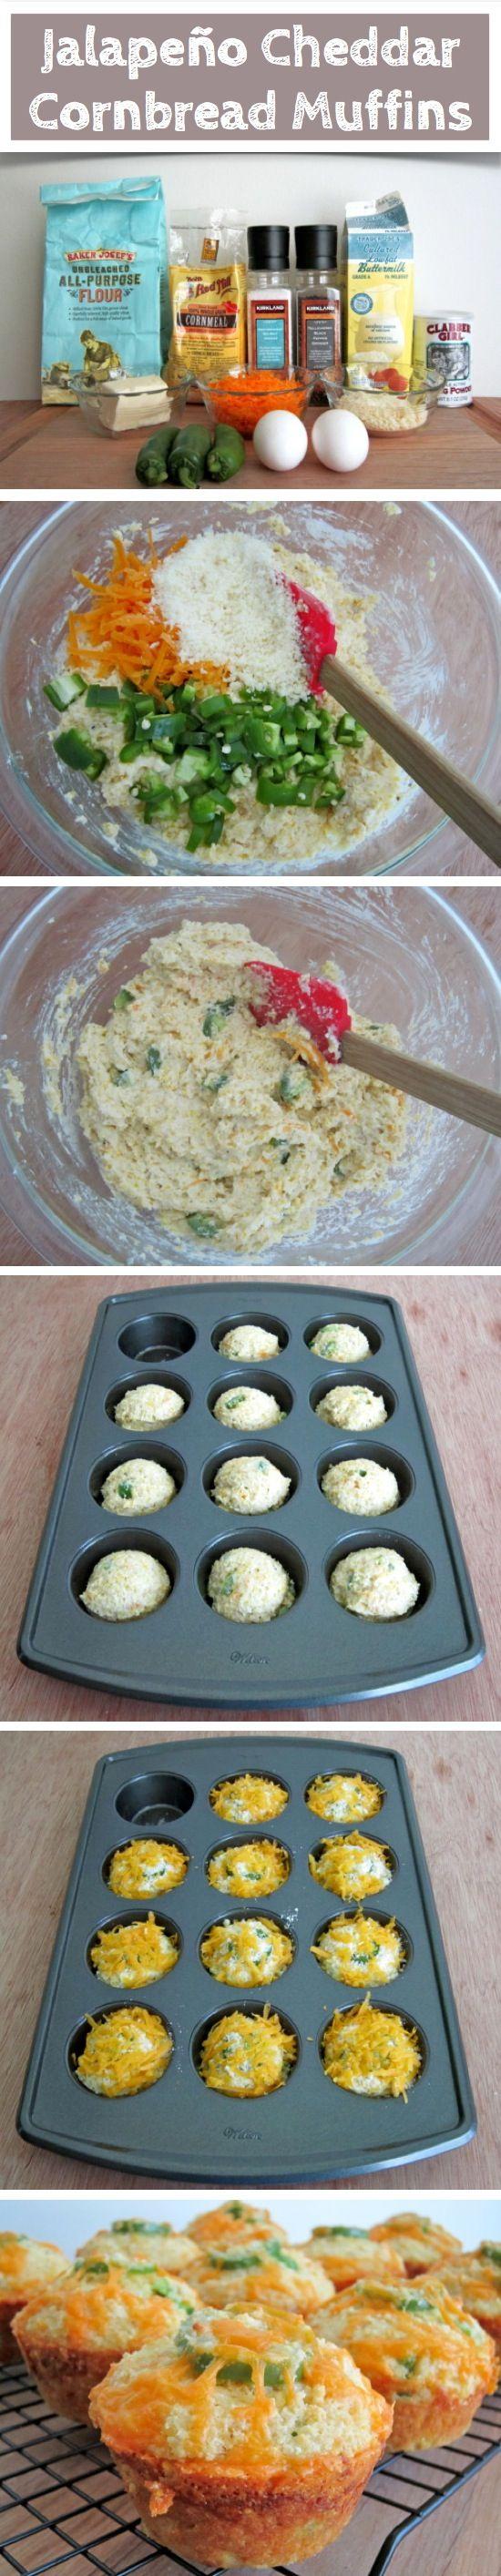 Jalapeño Cheddar Cornbread Muffins